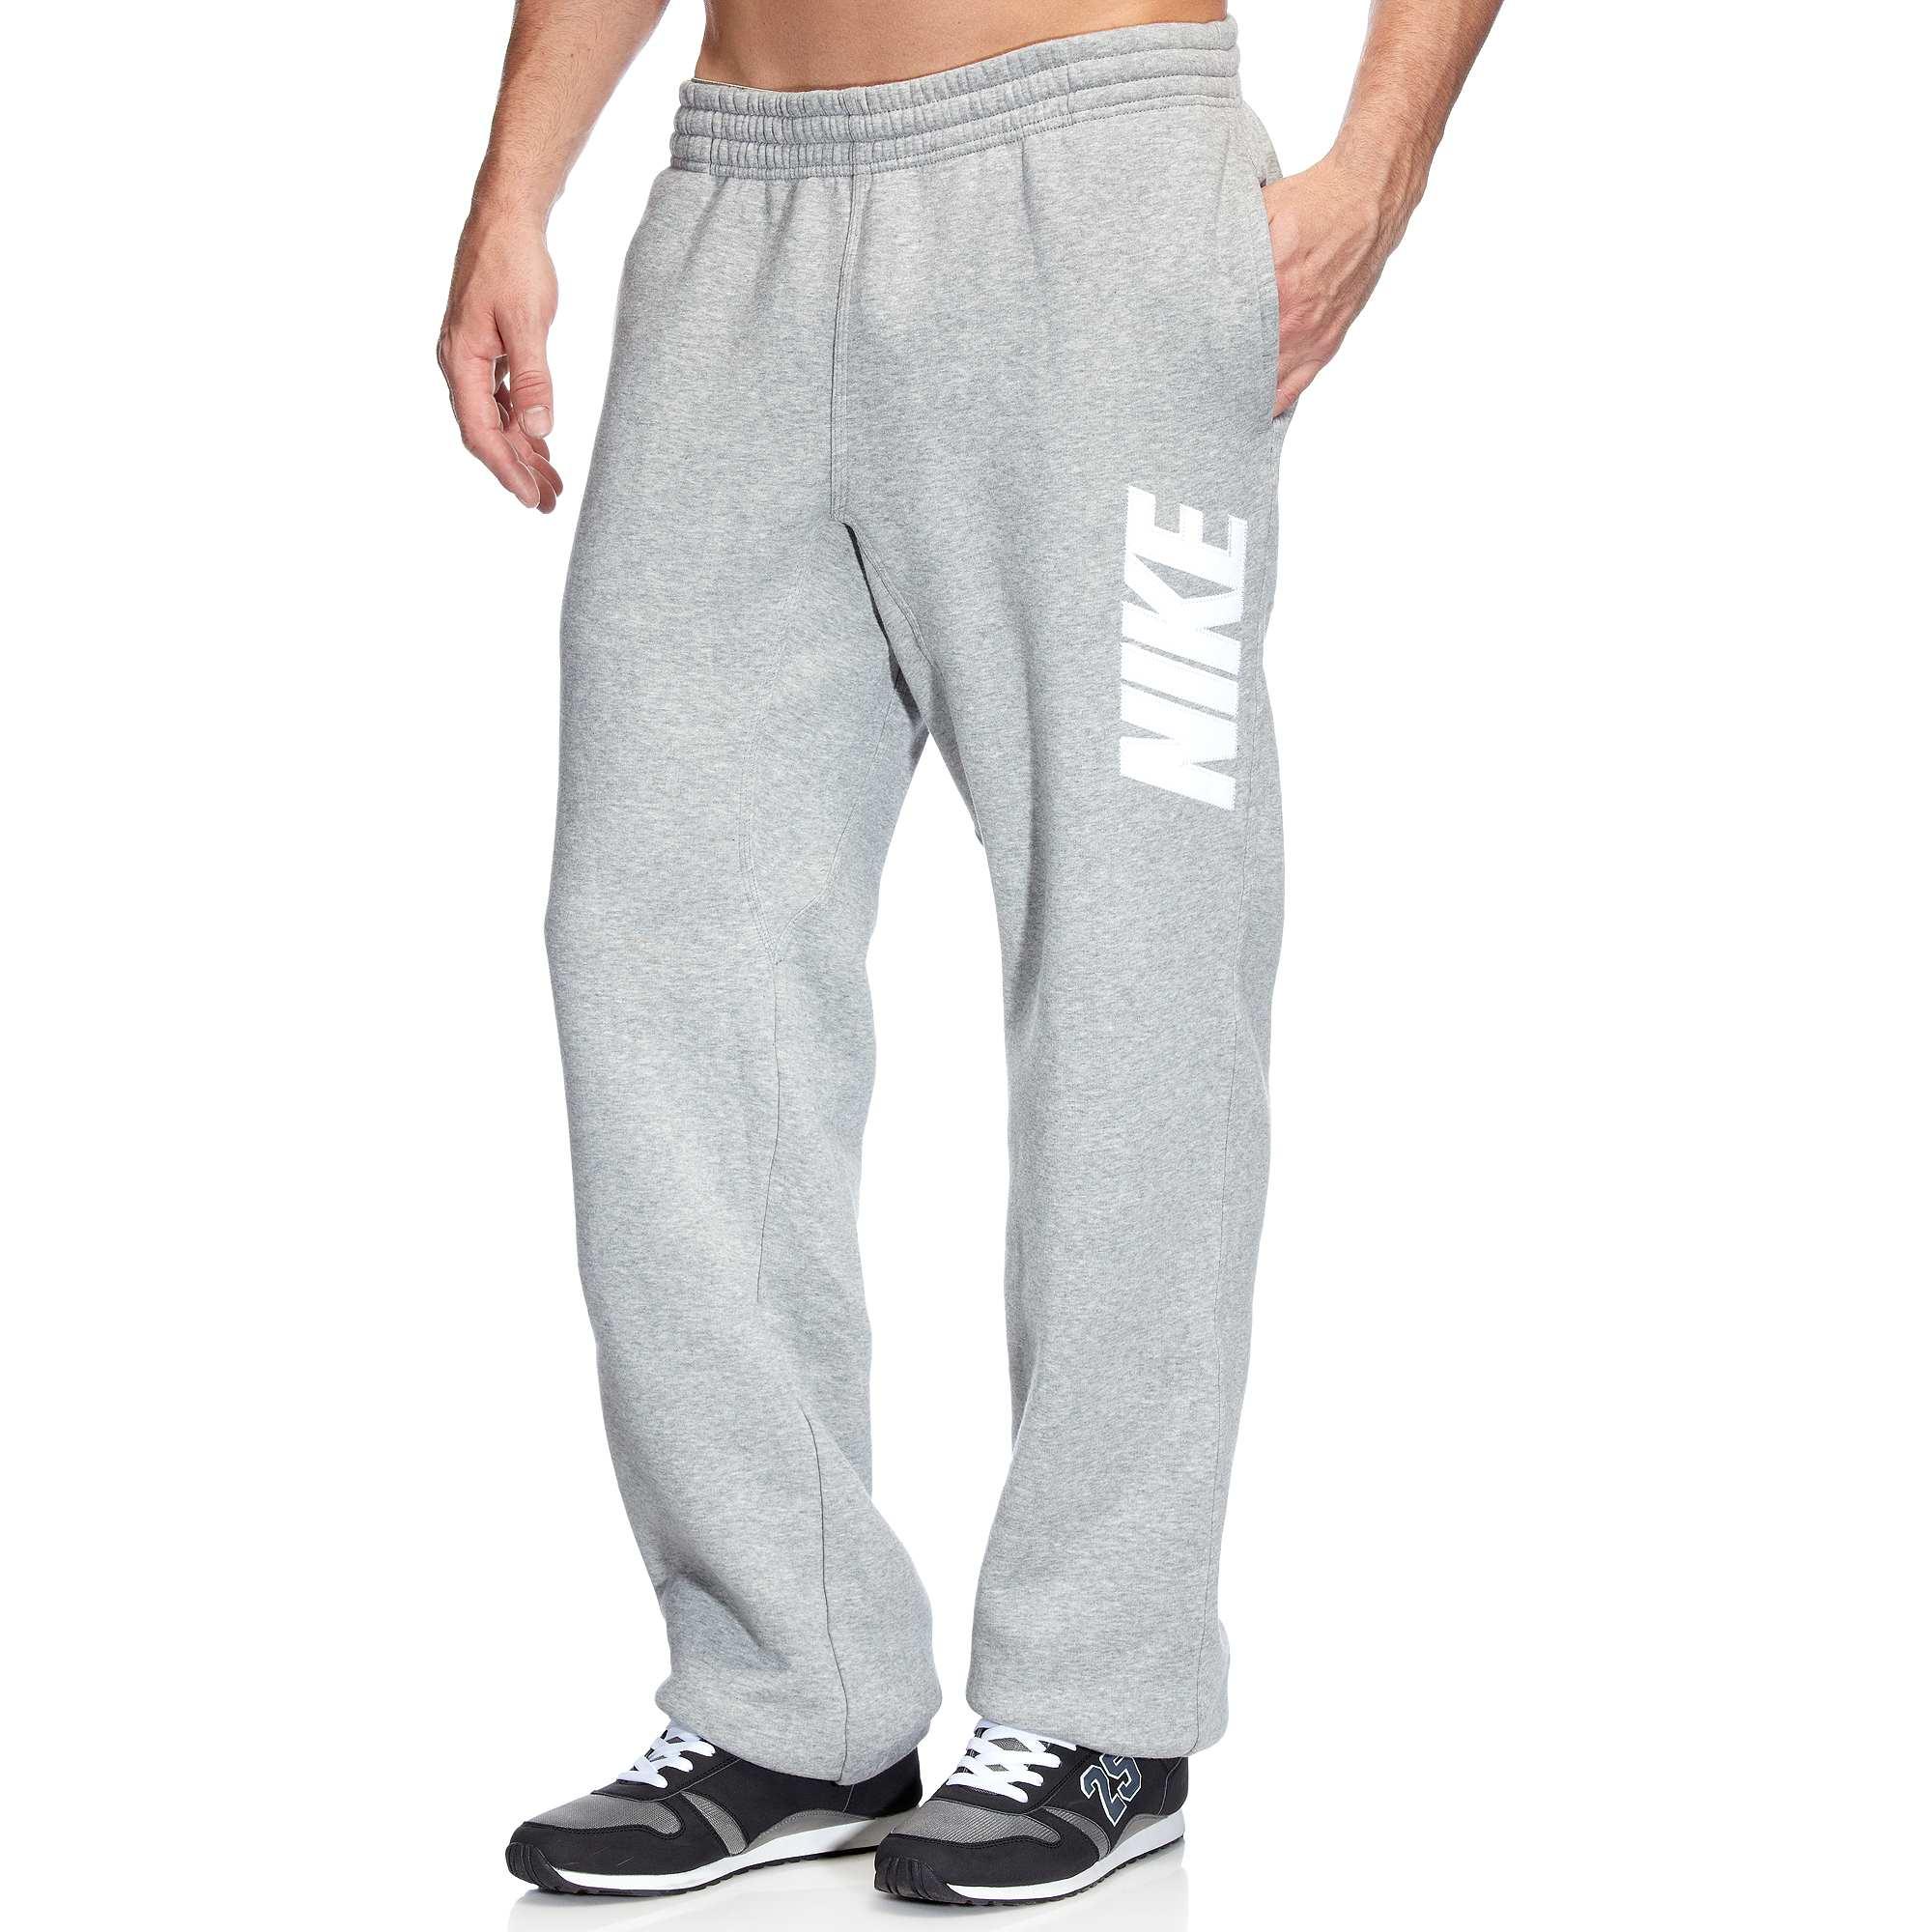 Doudoune Pull Sport D'hiver amp; Homme Vetement Chapka Pantalon Nike ZHwRR